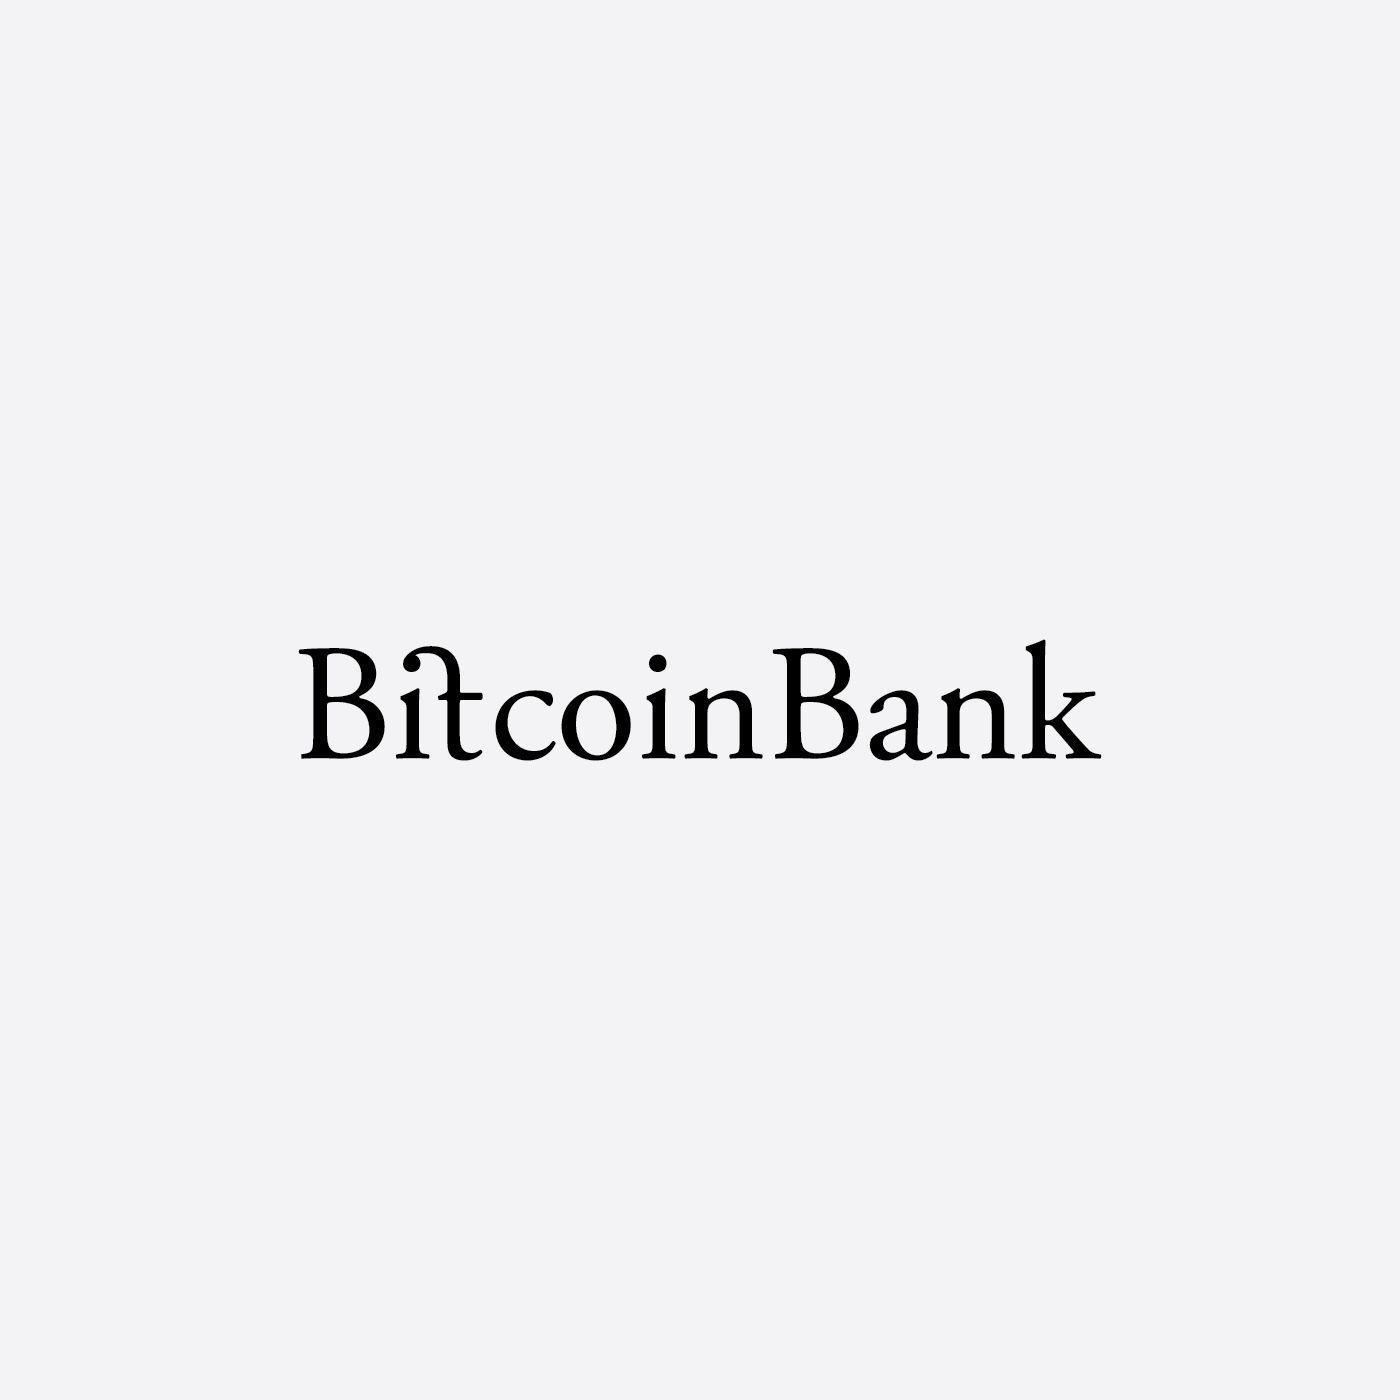 BitcoinBank - Логотип - дизайнер rikozi